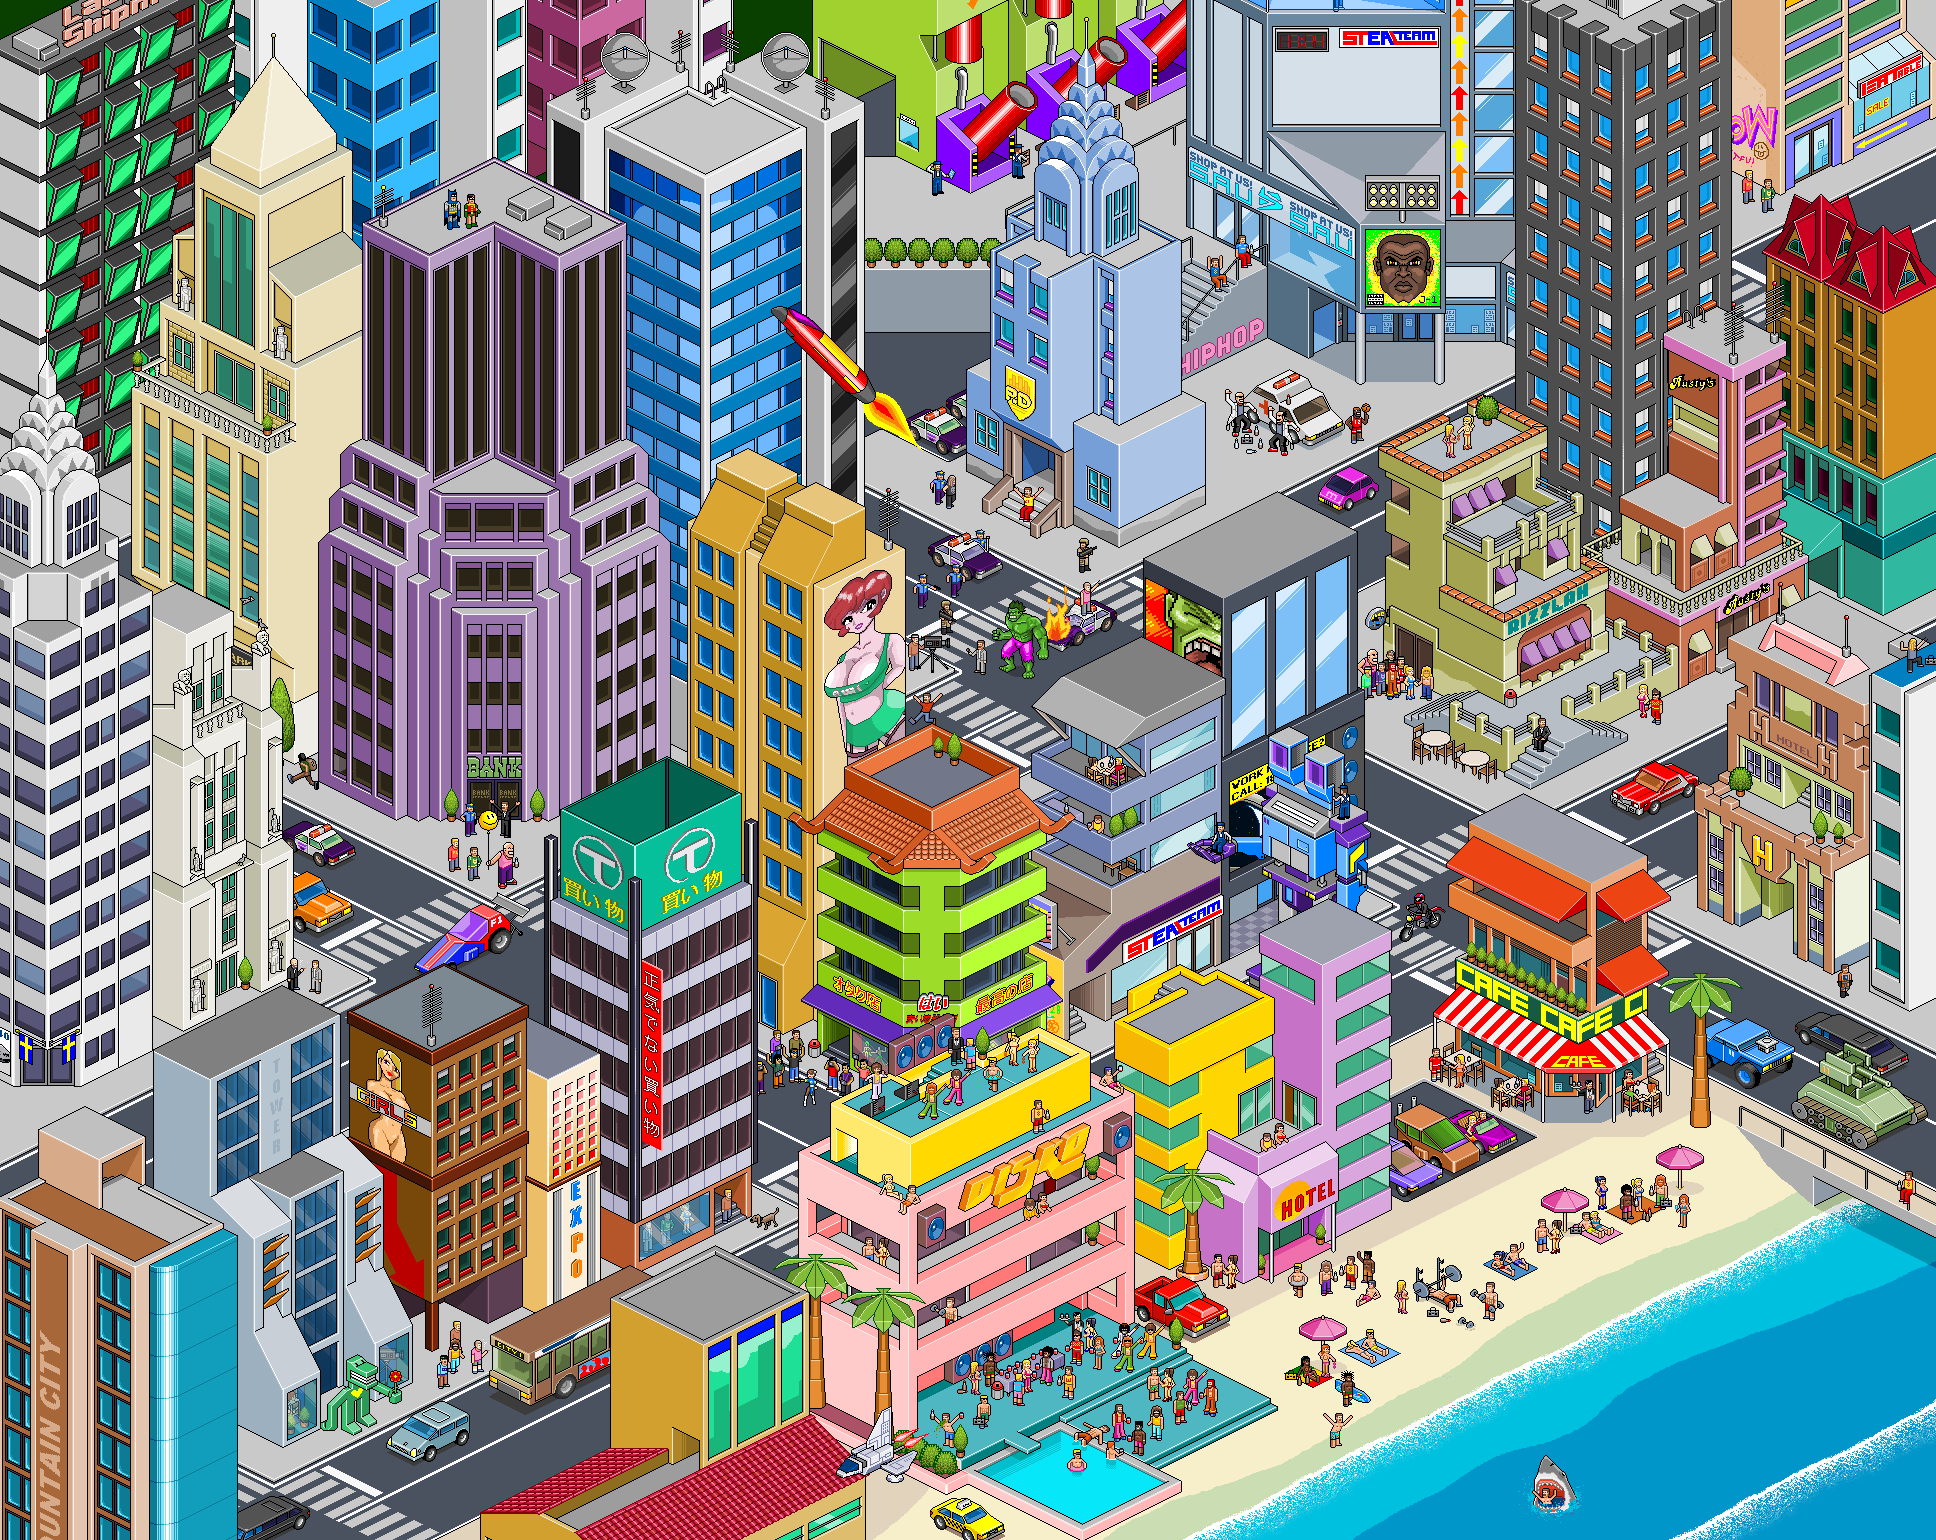 images?q=tbn:ANd9GcQh_l3eQ5xwiPy07kGEXjmjgmBKBRB7H2mRxCGhv1tFWg5c_mWT Pixel Art City @koolgadgetz.com.info